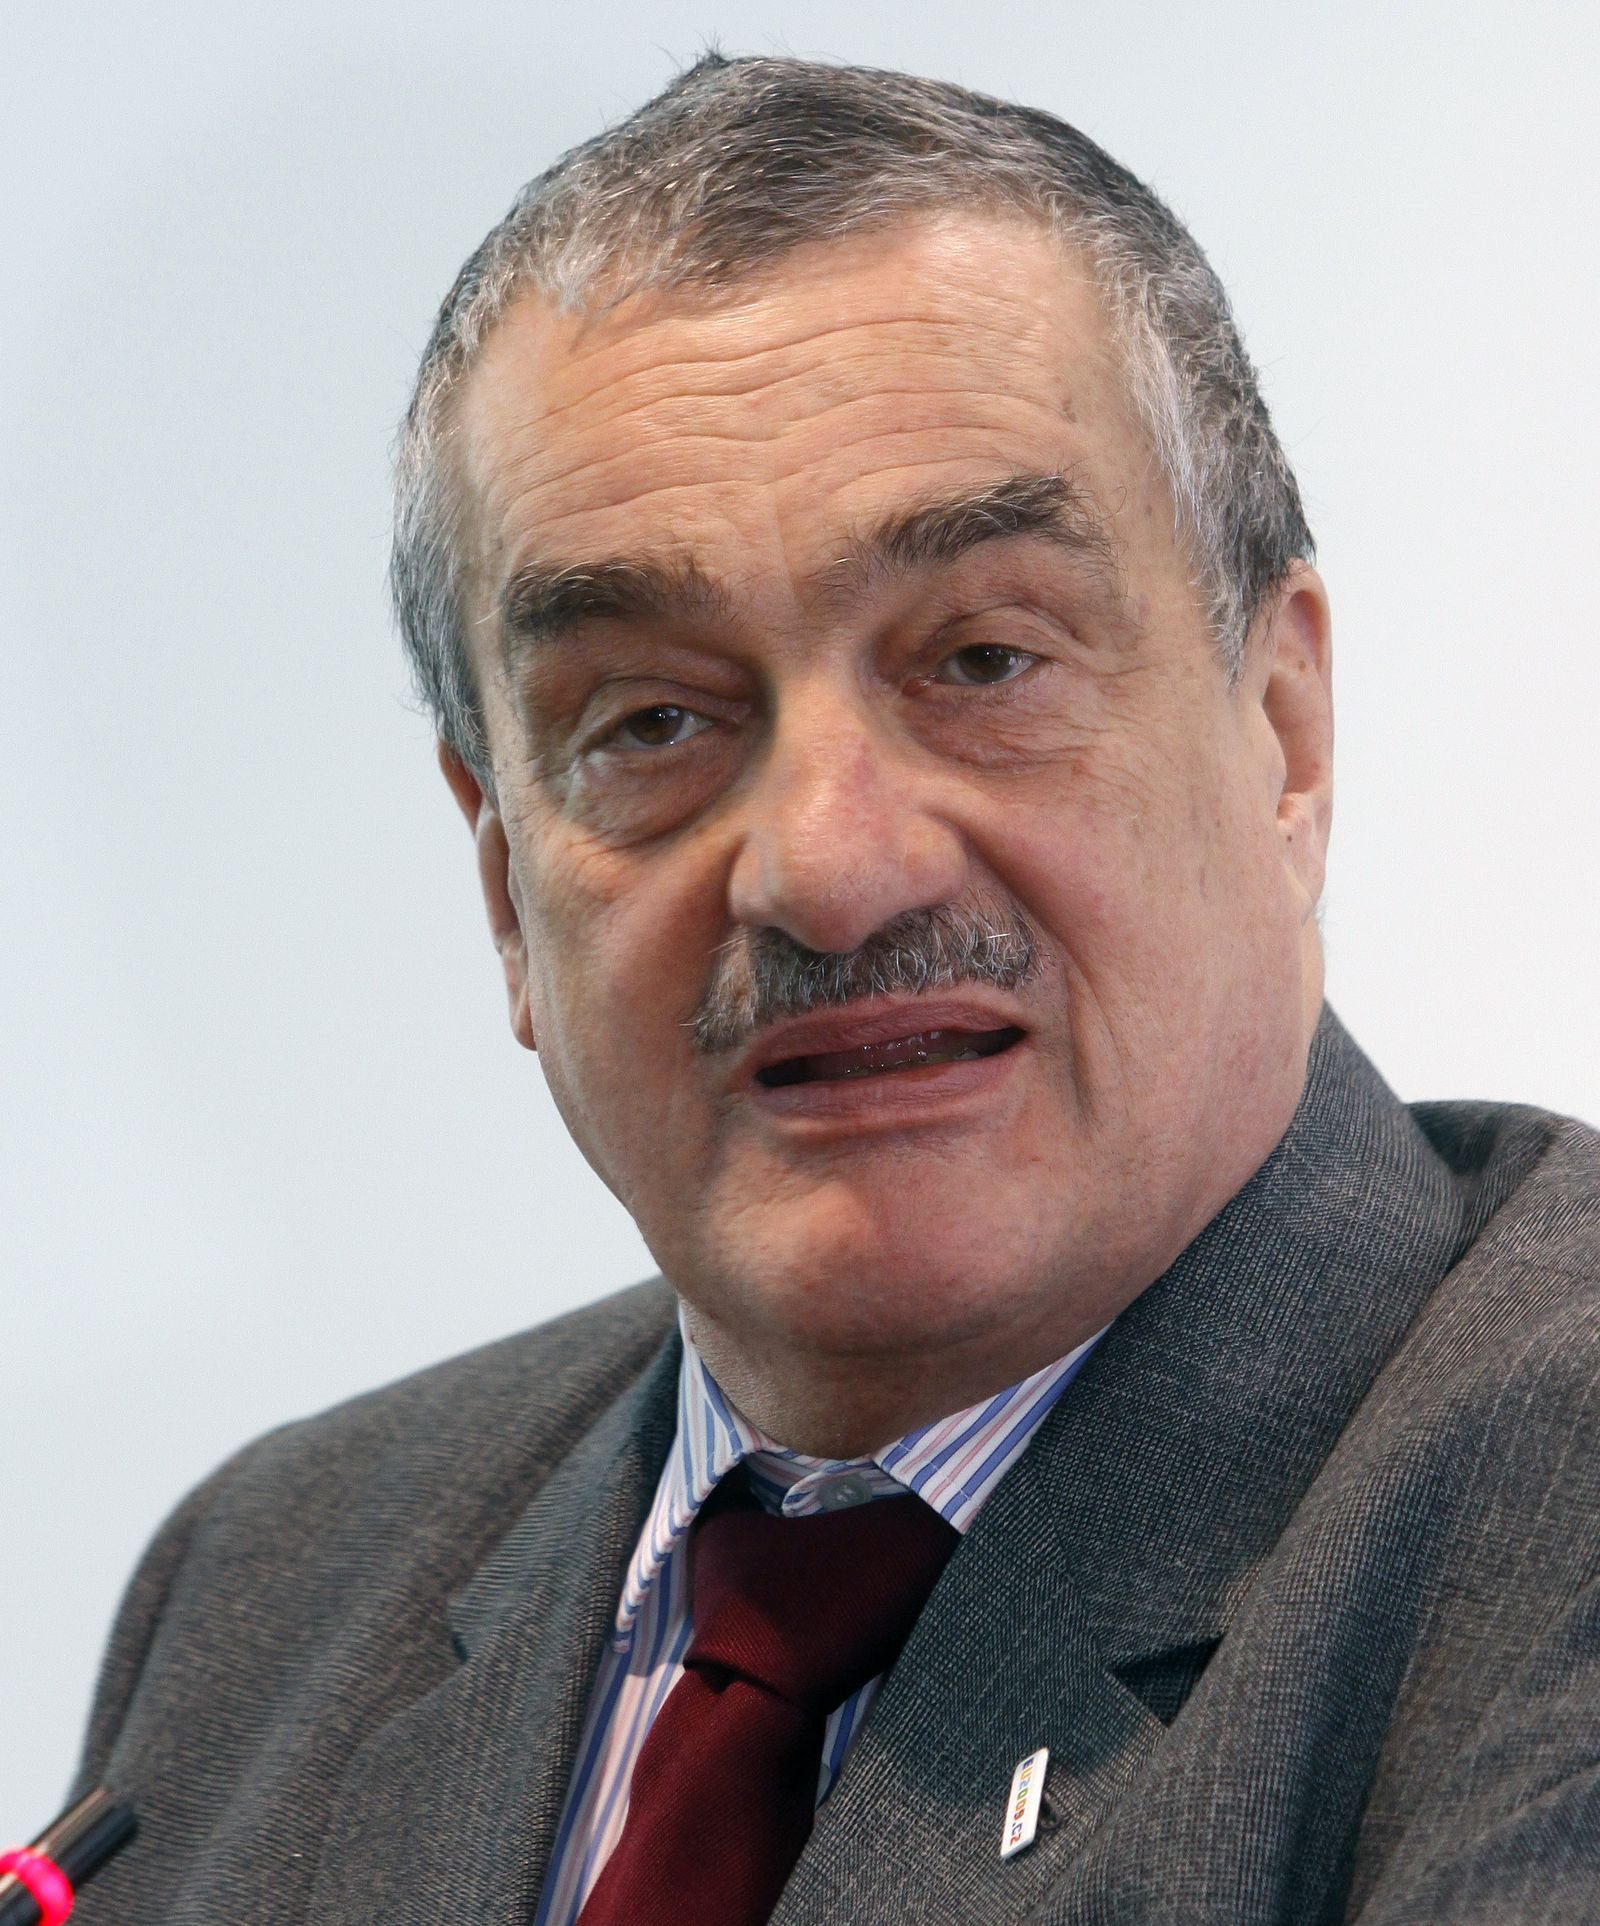 Karel Schwarzenberg